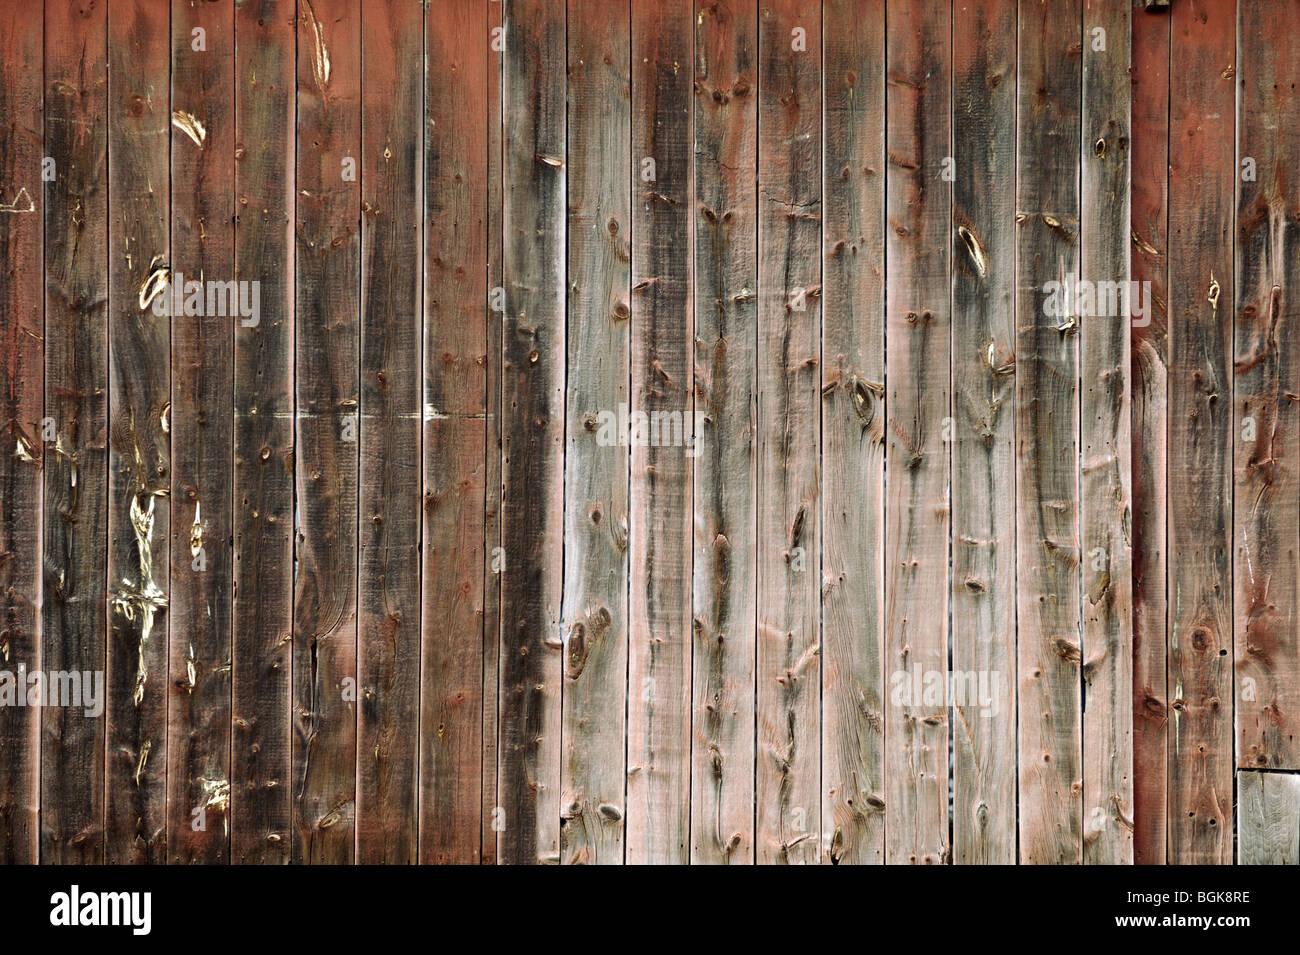 Placas de madera desgastada sucio textura de fondo Imagen De Stock